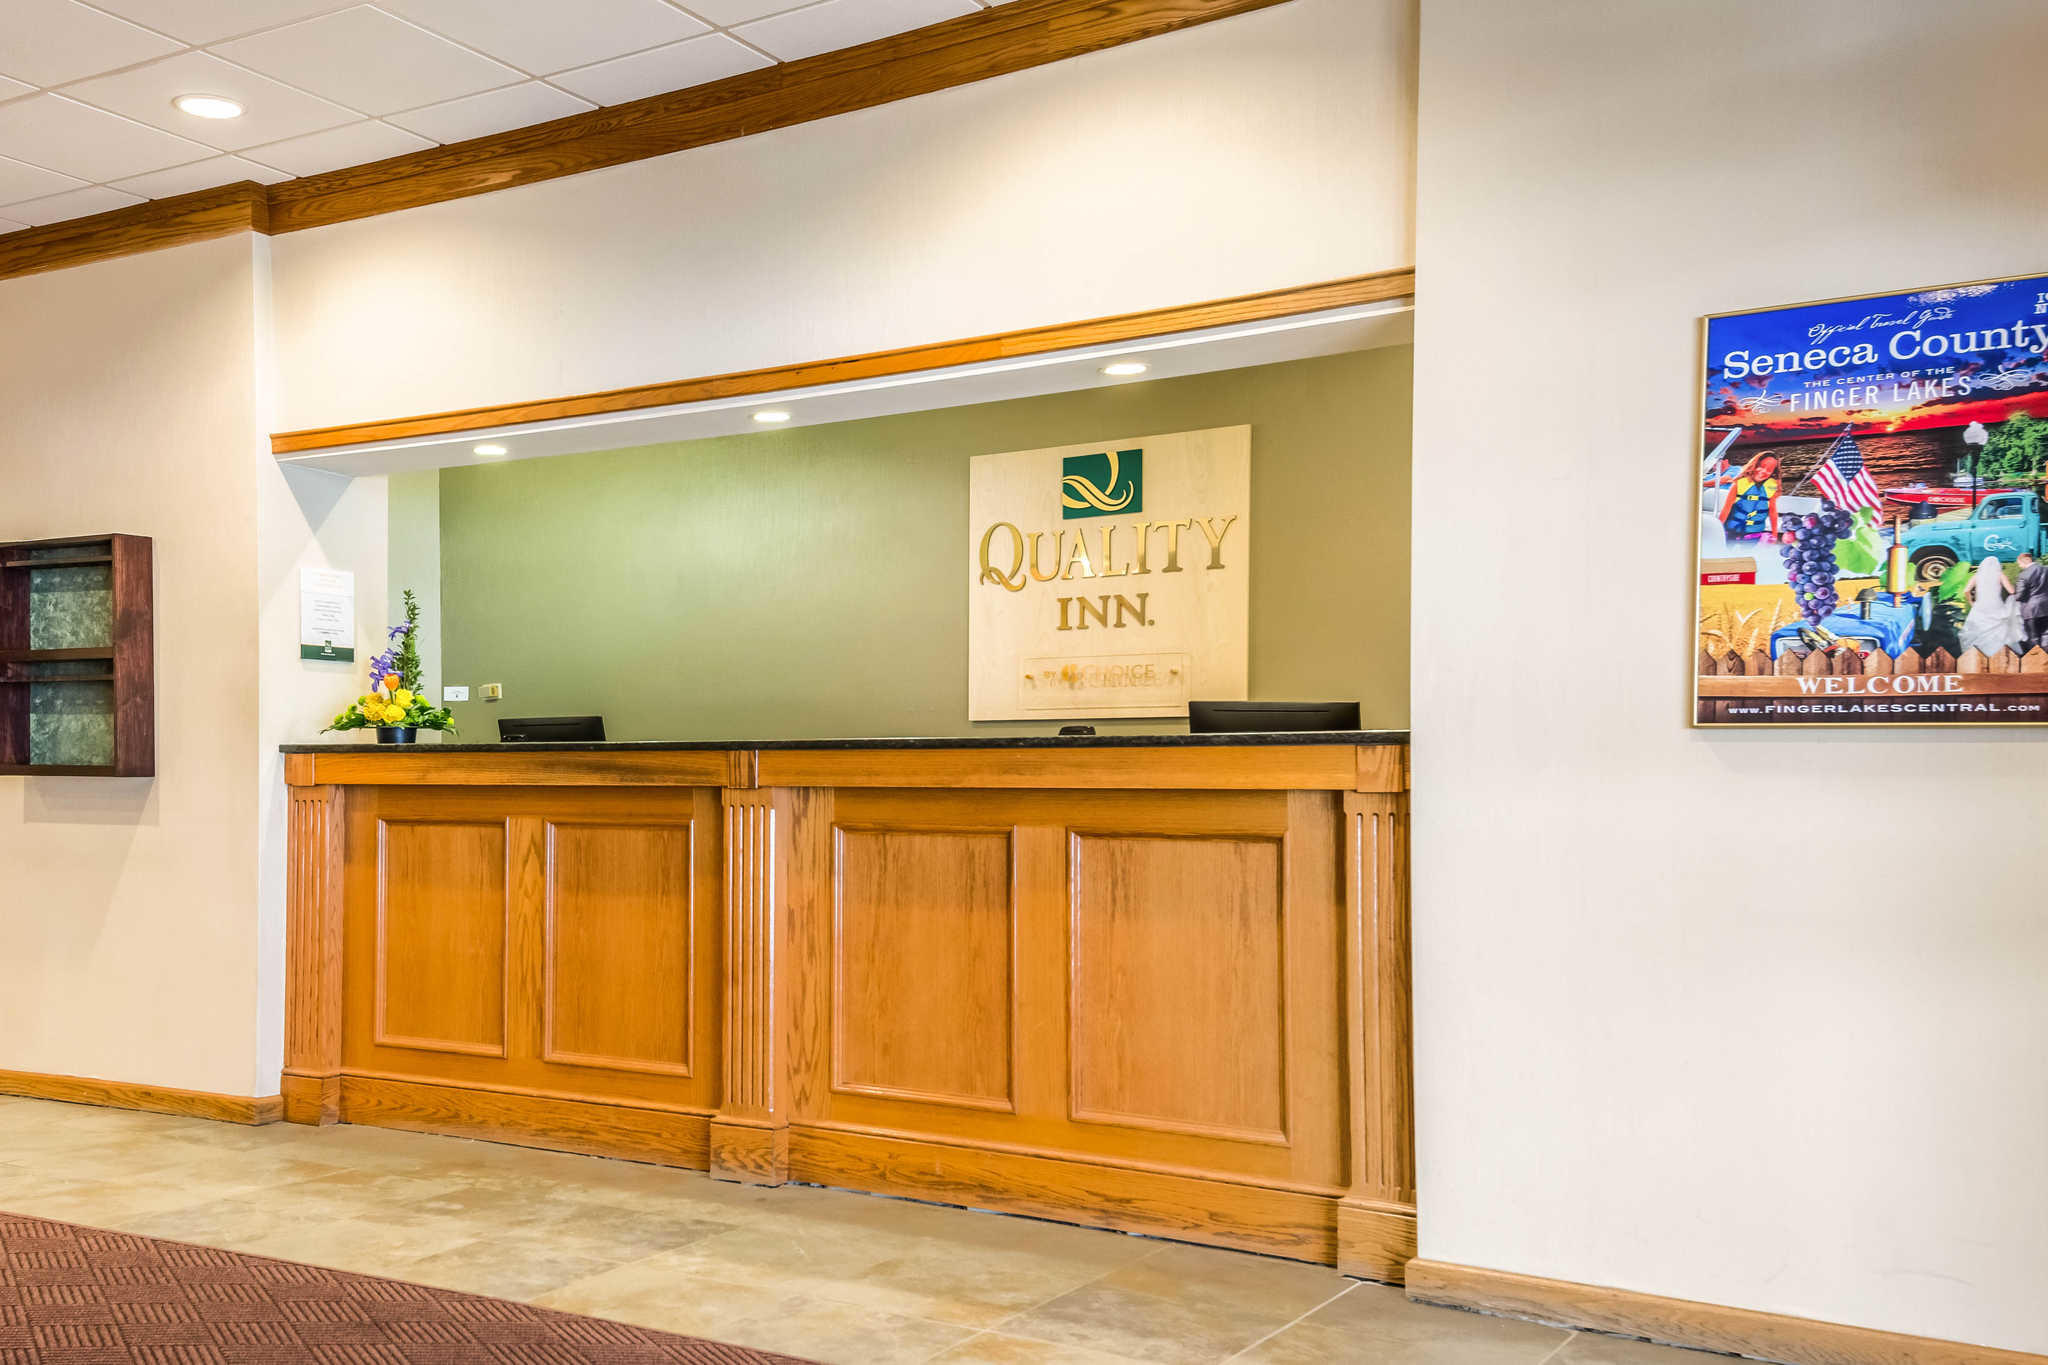 Quality Inn near Finger Lakes and Seneca Falls image 1